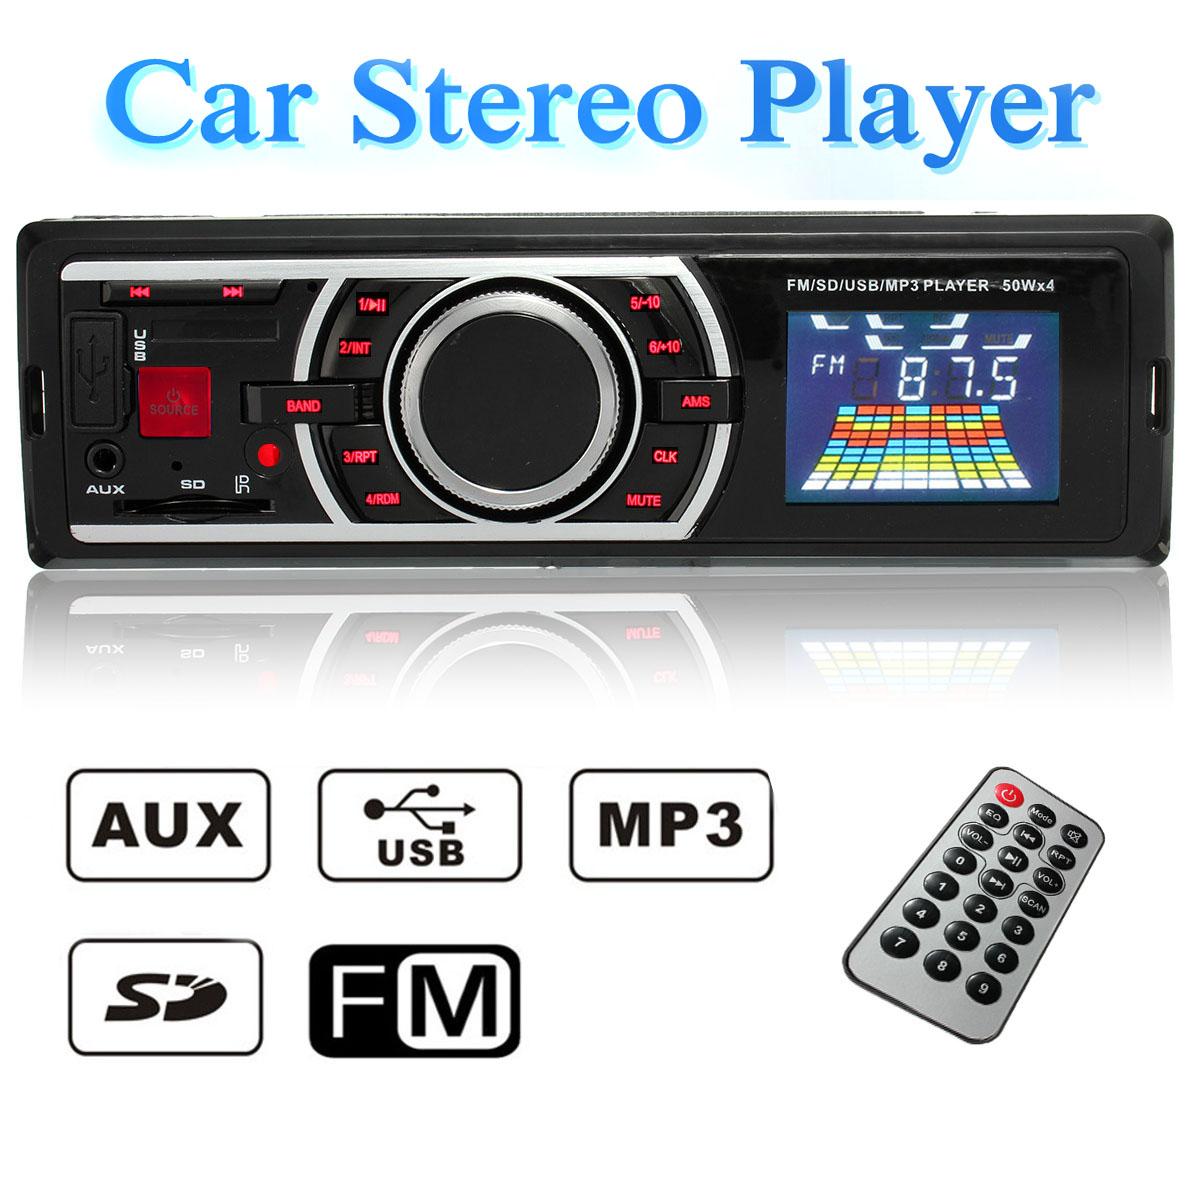 Remote Control Car Stereo FM Radio MP3 Hand Free Music Player Calls In-Dash Single Din USB SD AUX